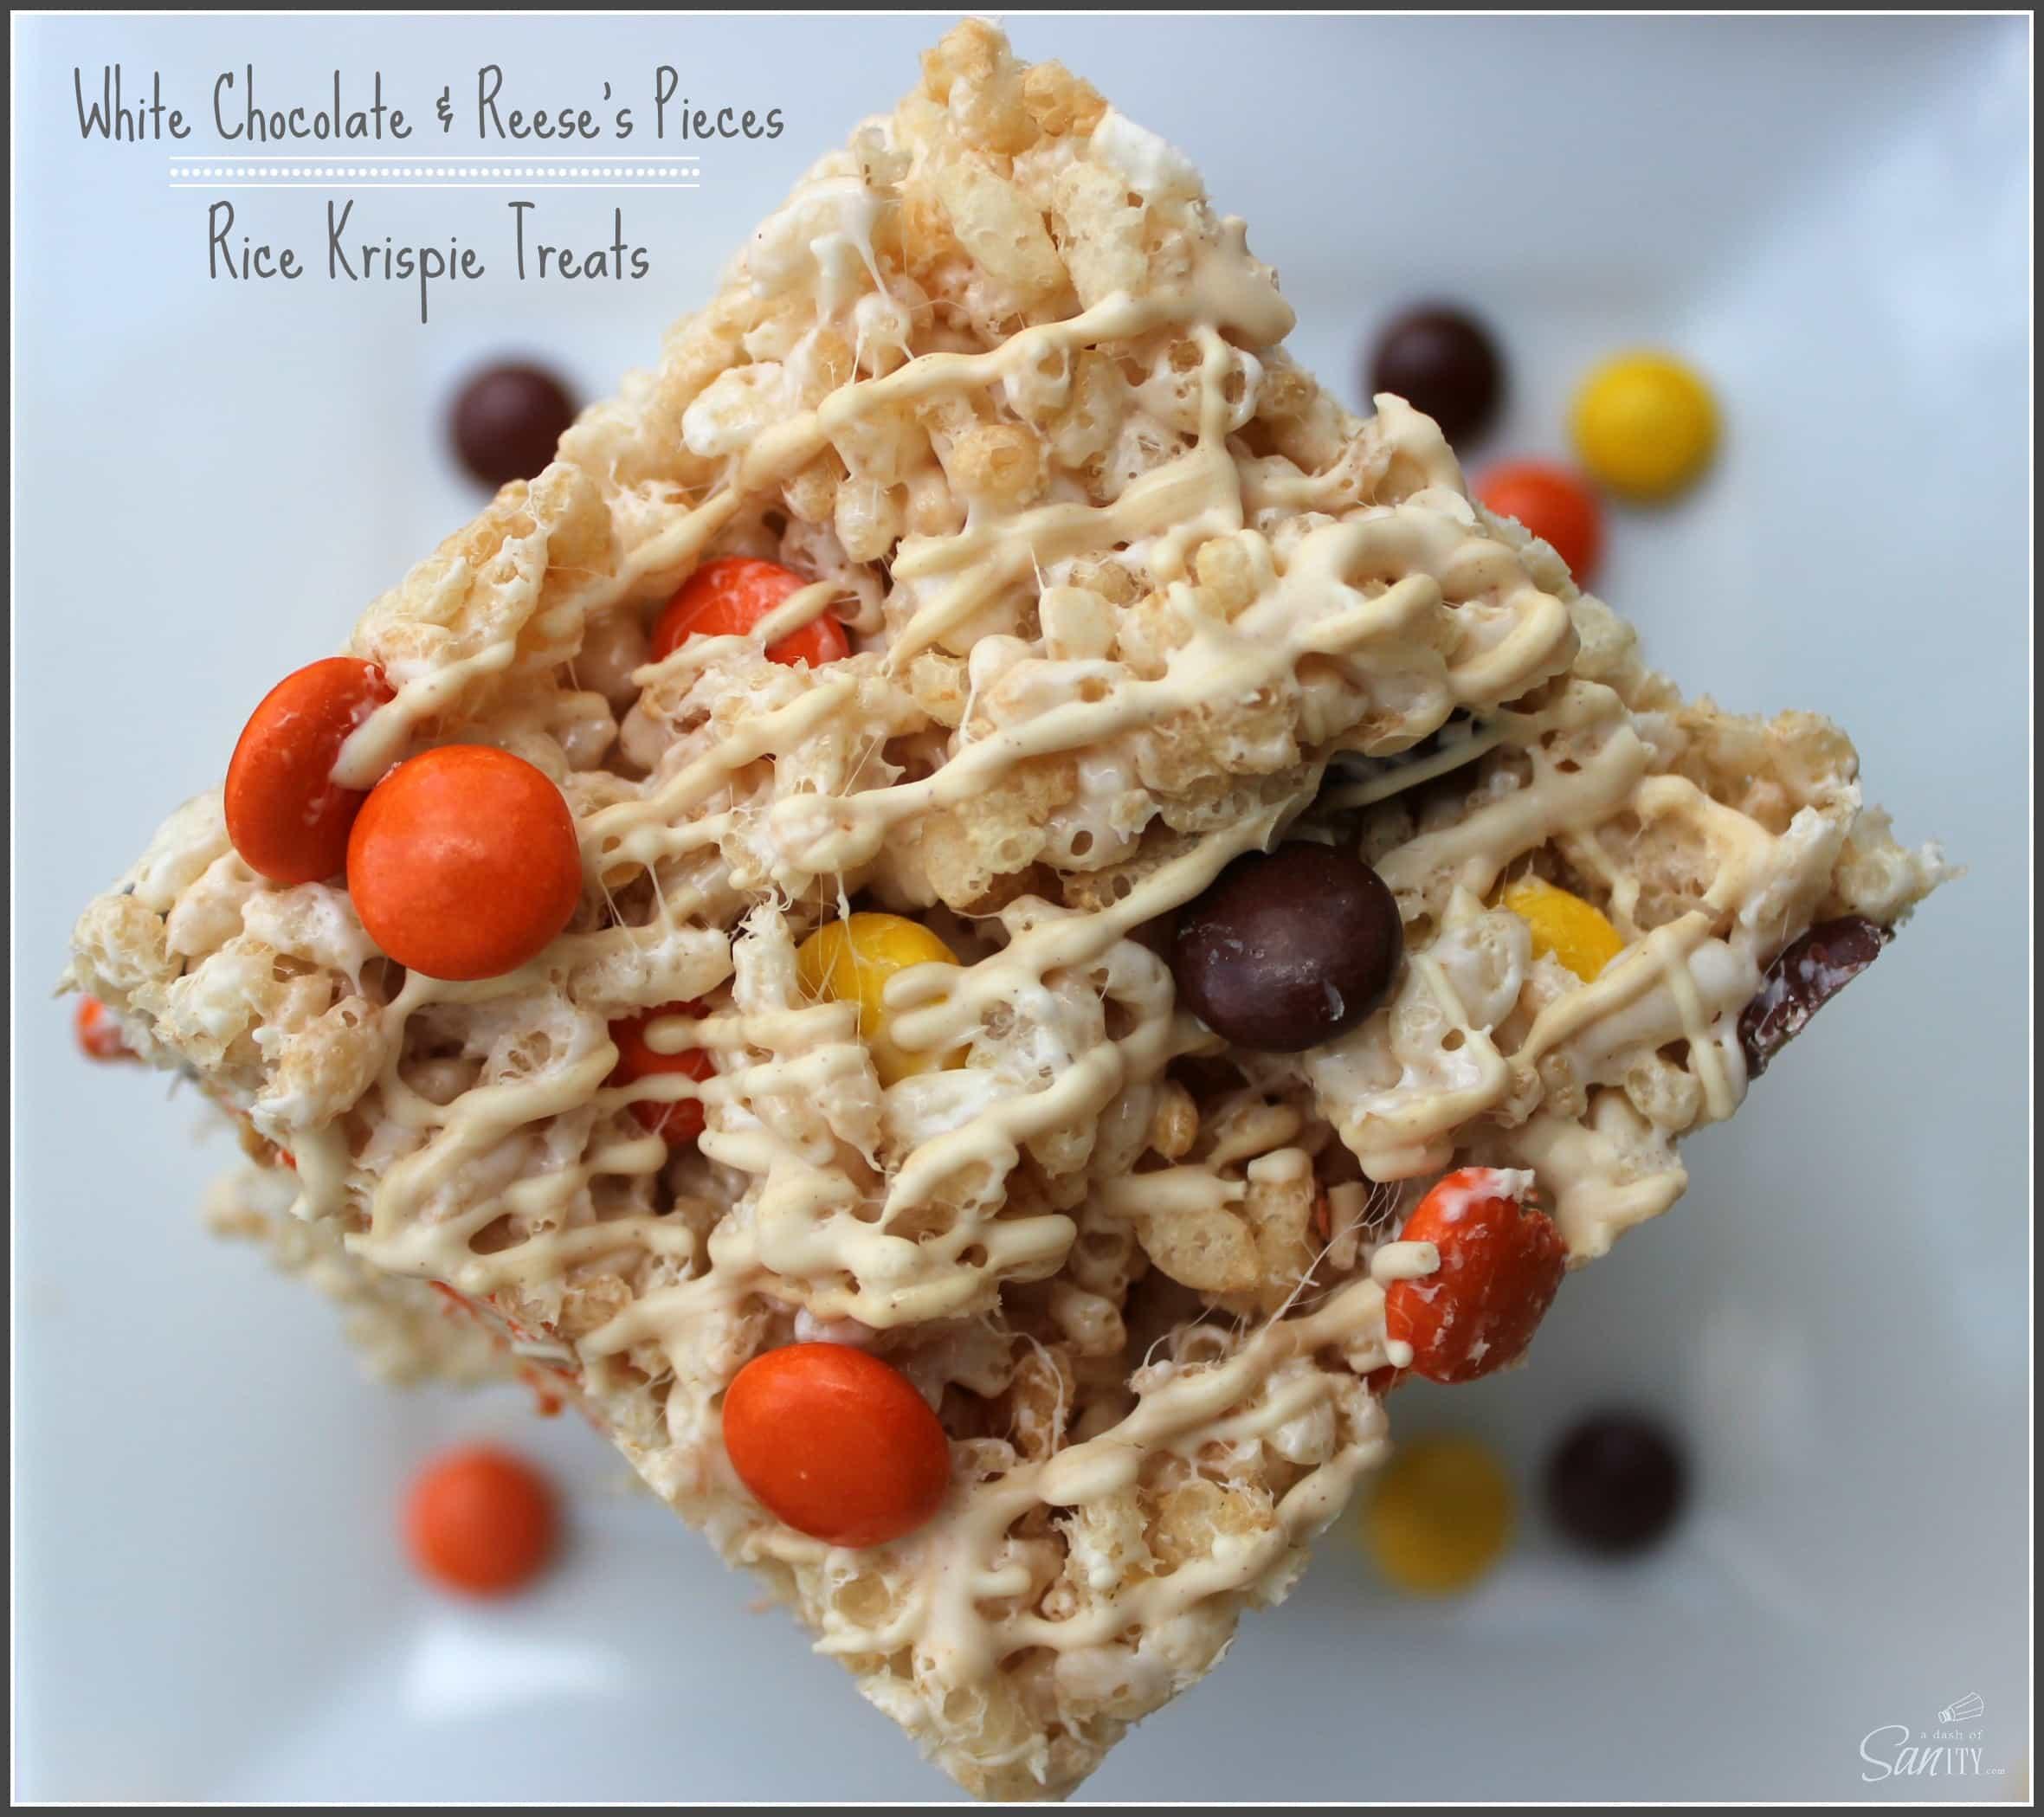 White Chocolate Reese's Pieces Rice Krispie Treats